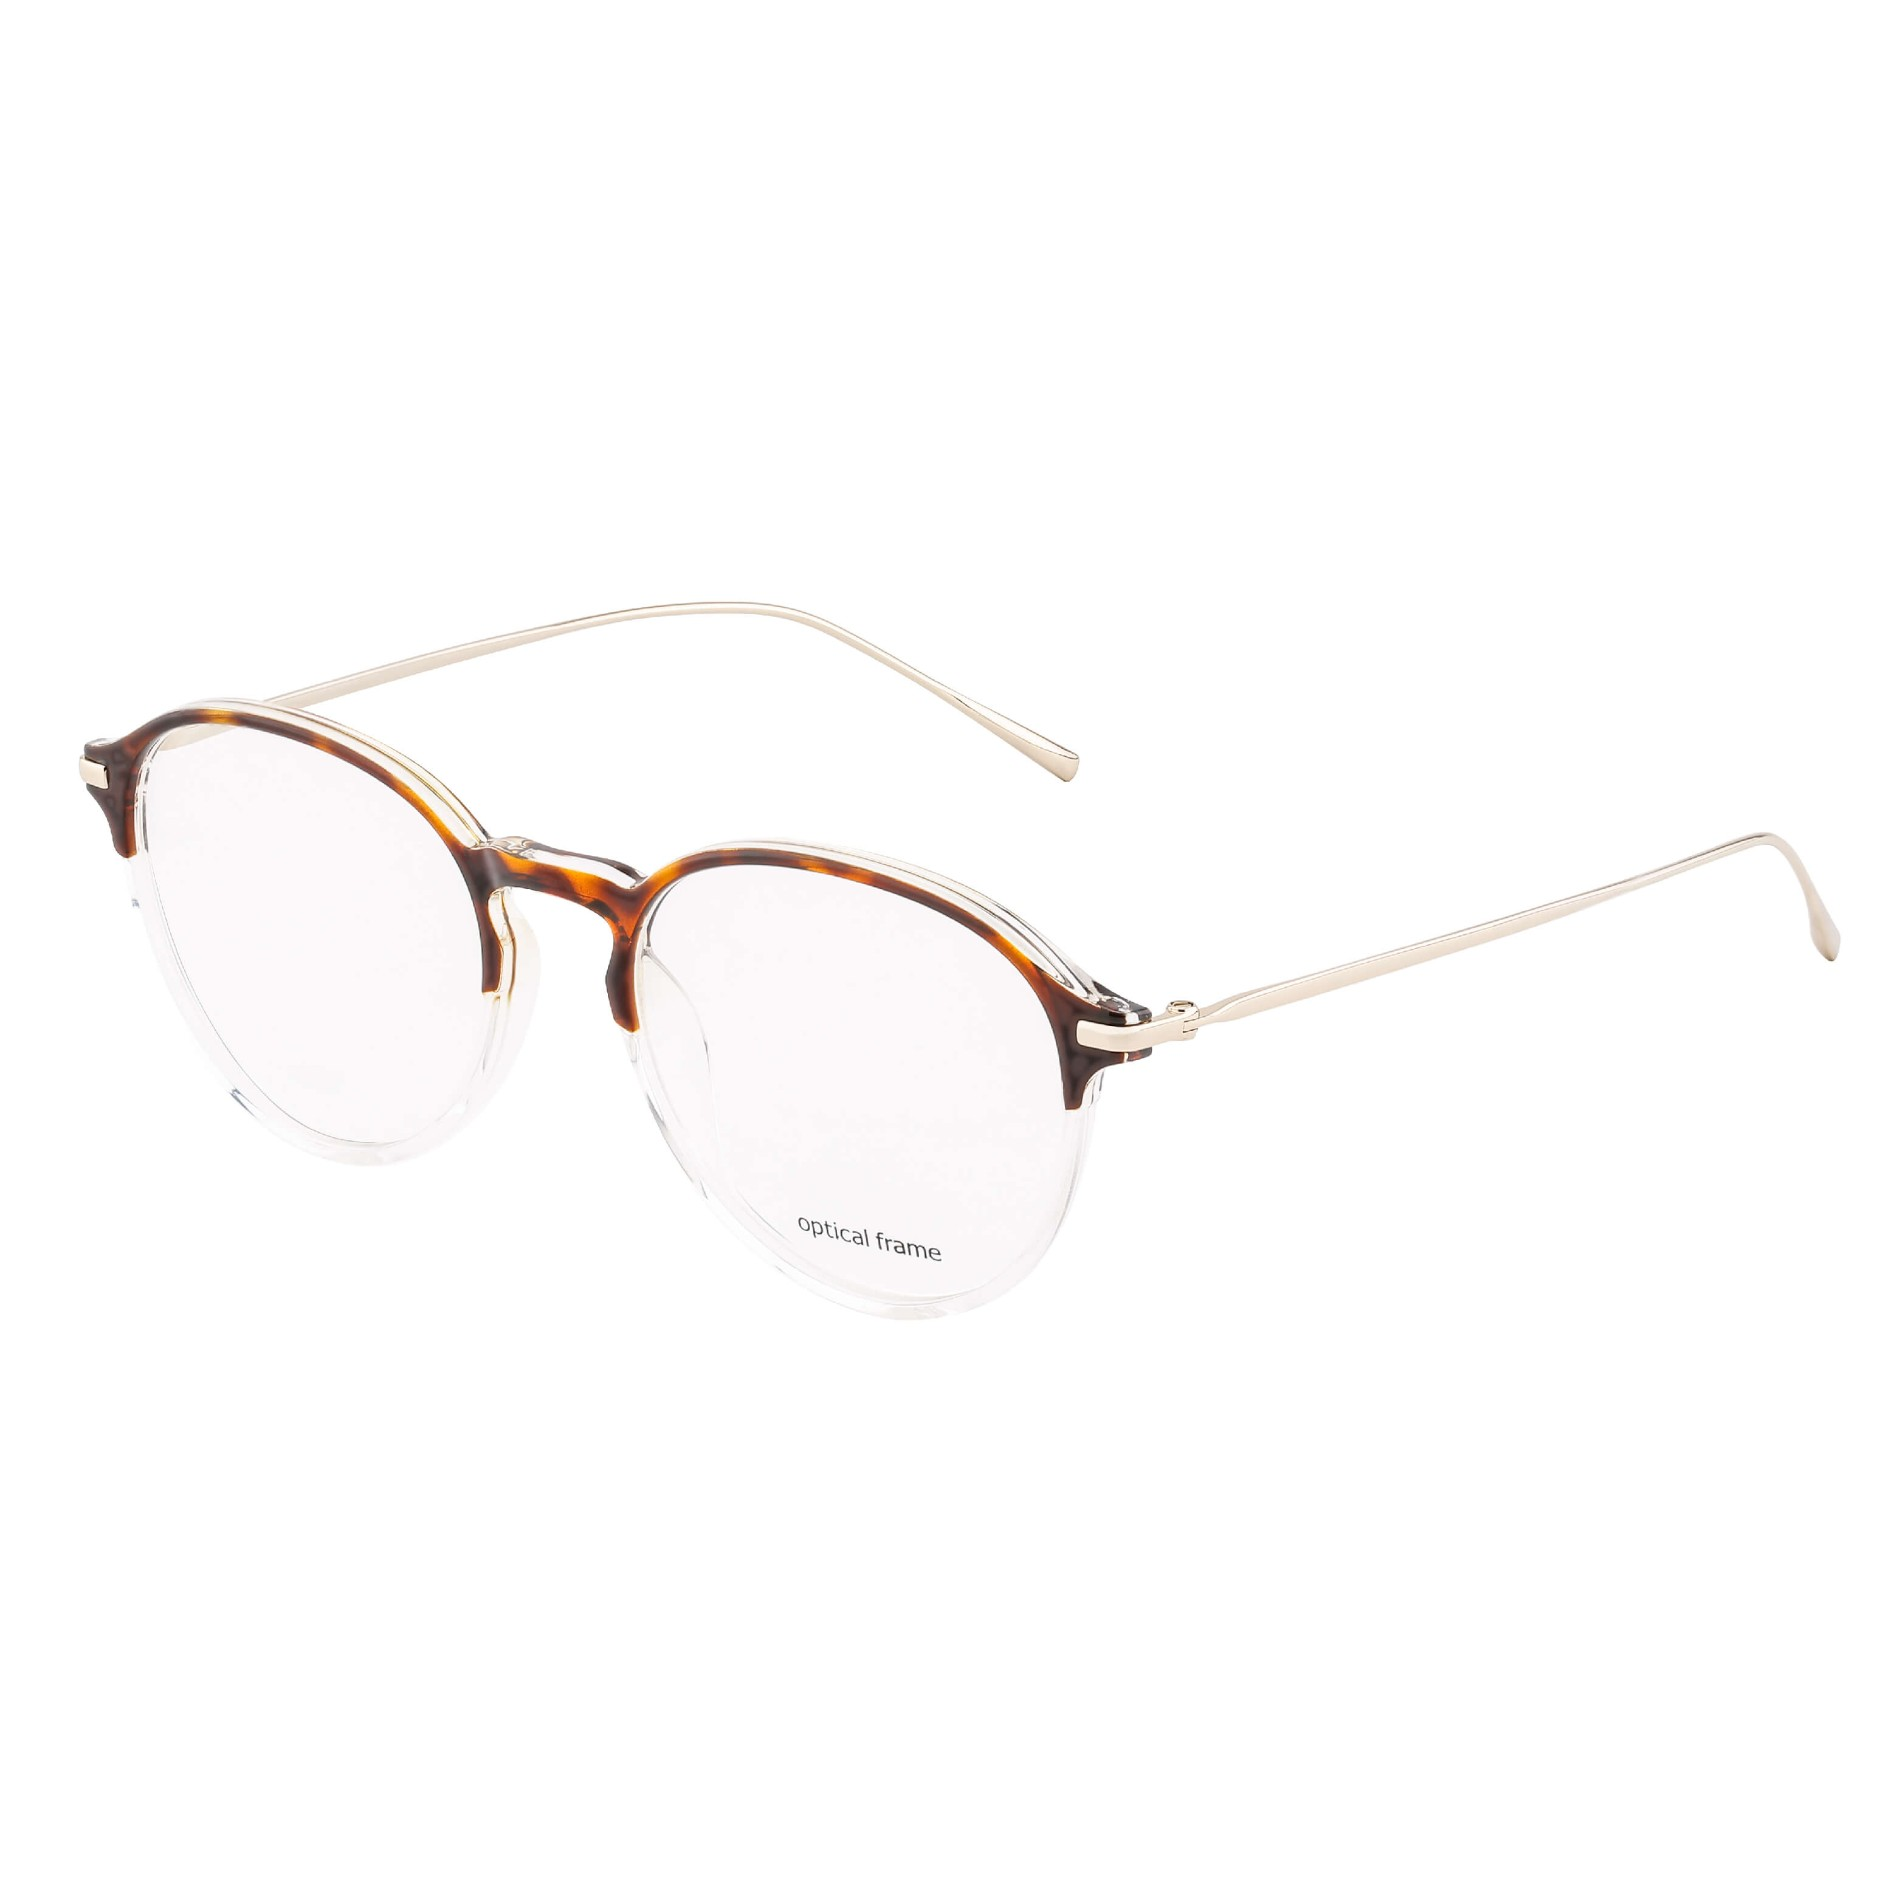 Ladies Business Style TR90 Ultralight Eyeglasses Frame